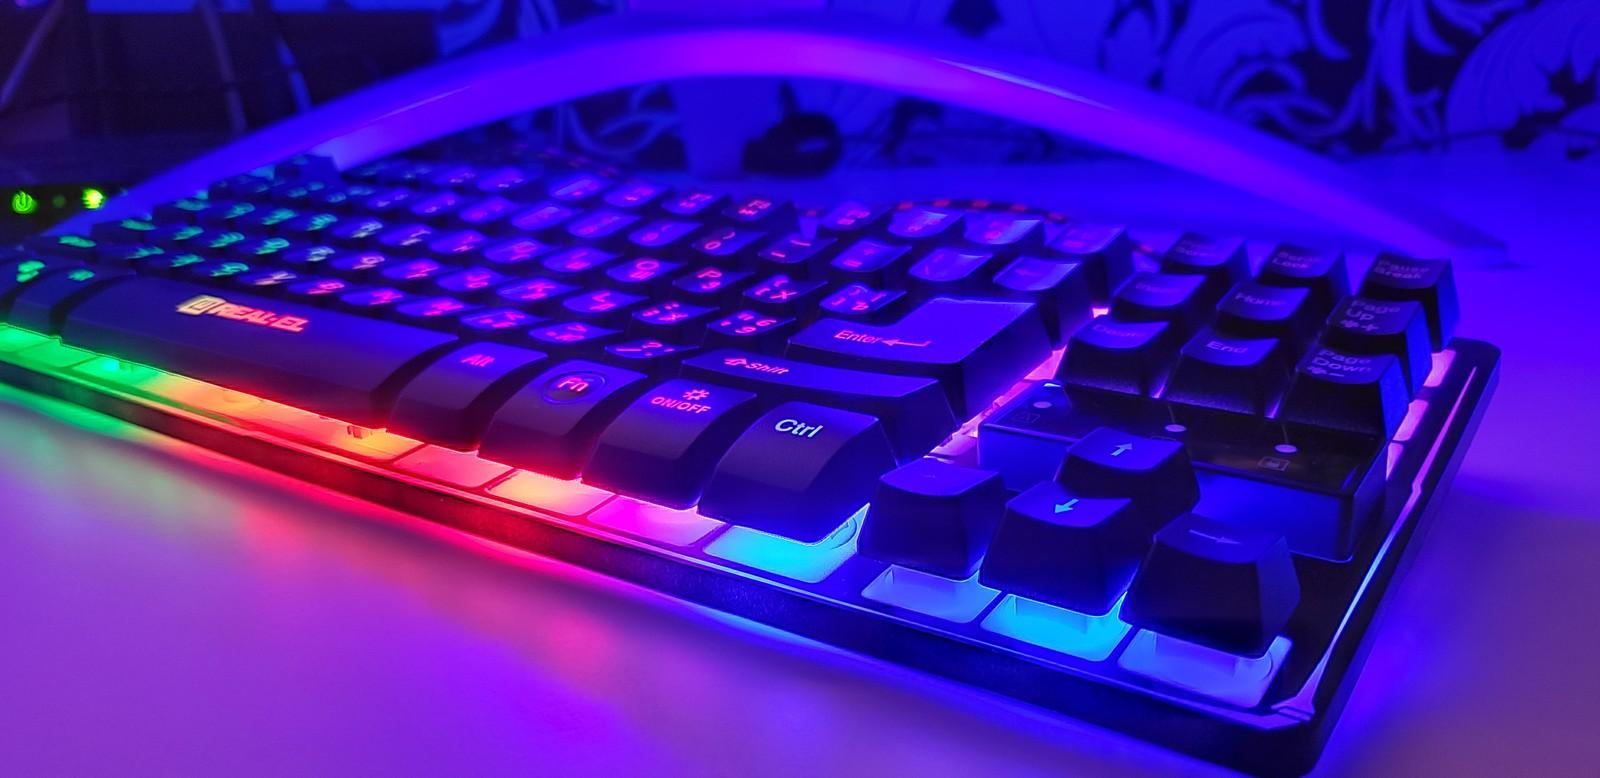 Фото подсветки клавиатуры REAL-EL Gaming 8710 TKL Backlit